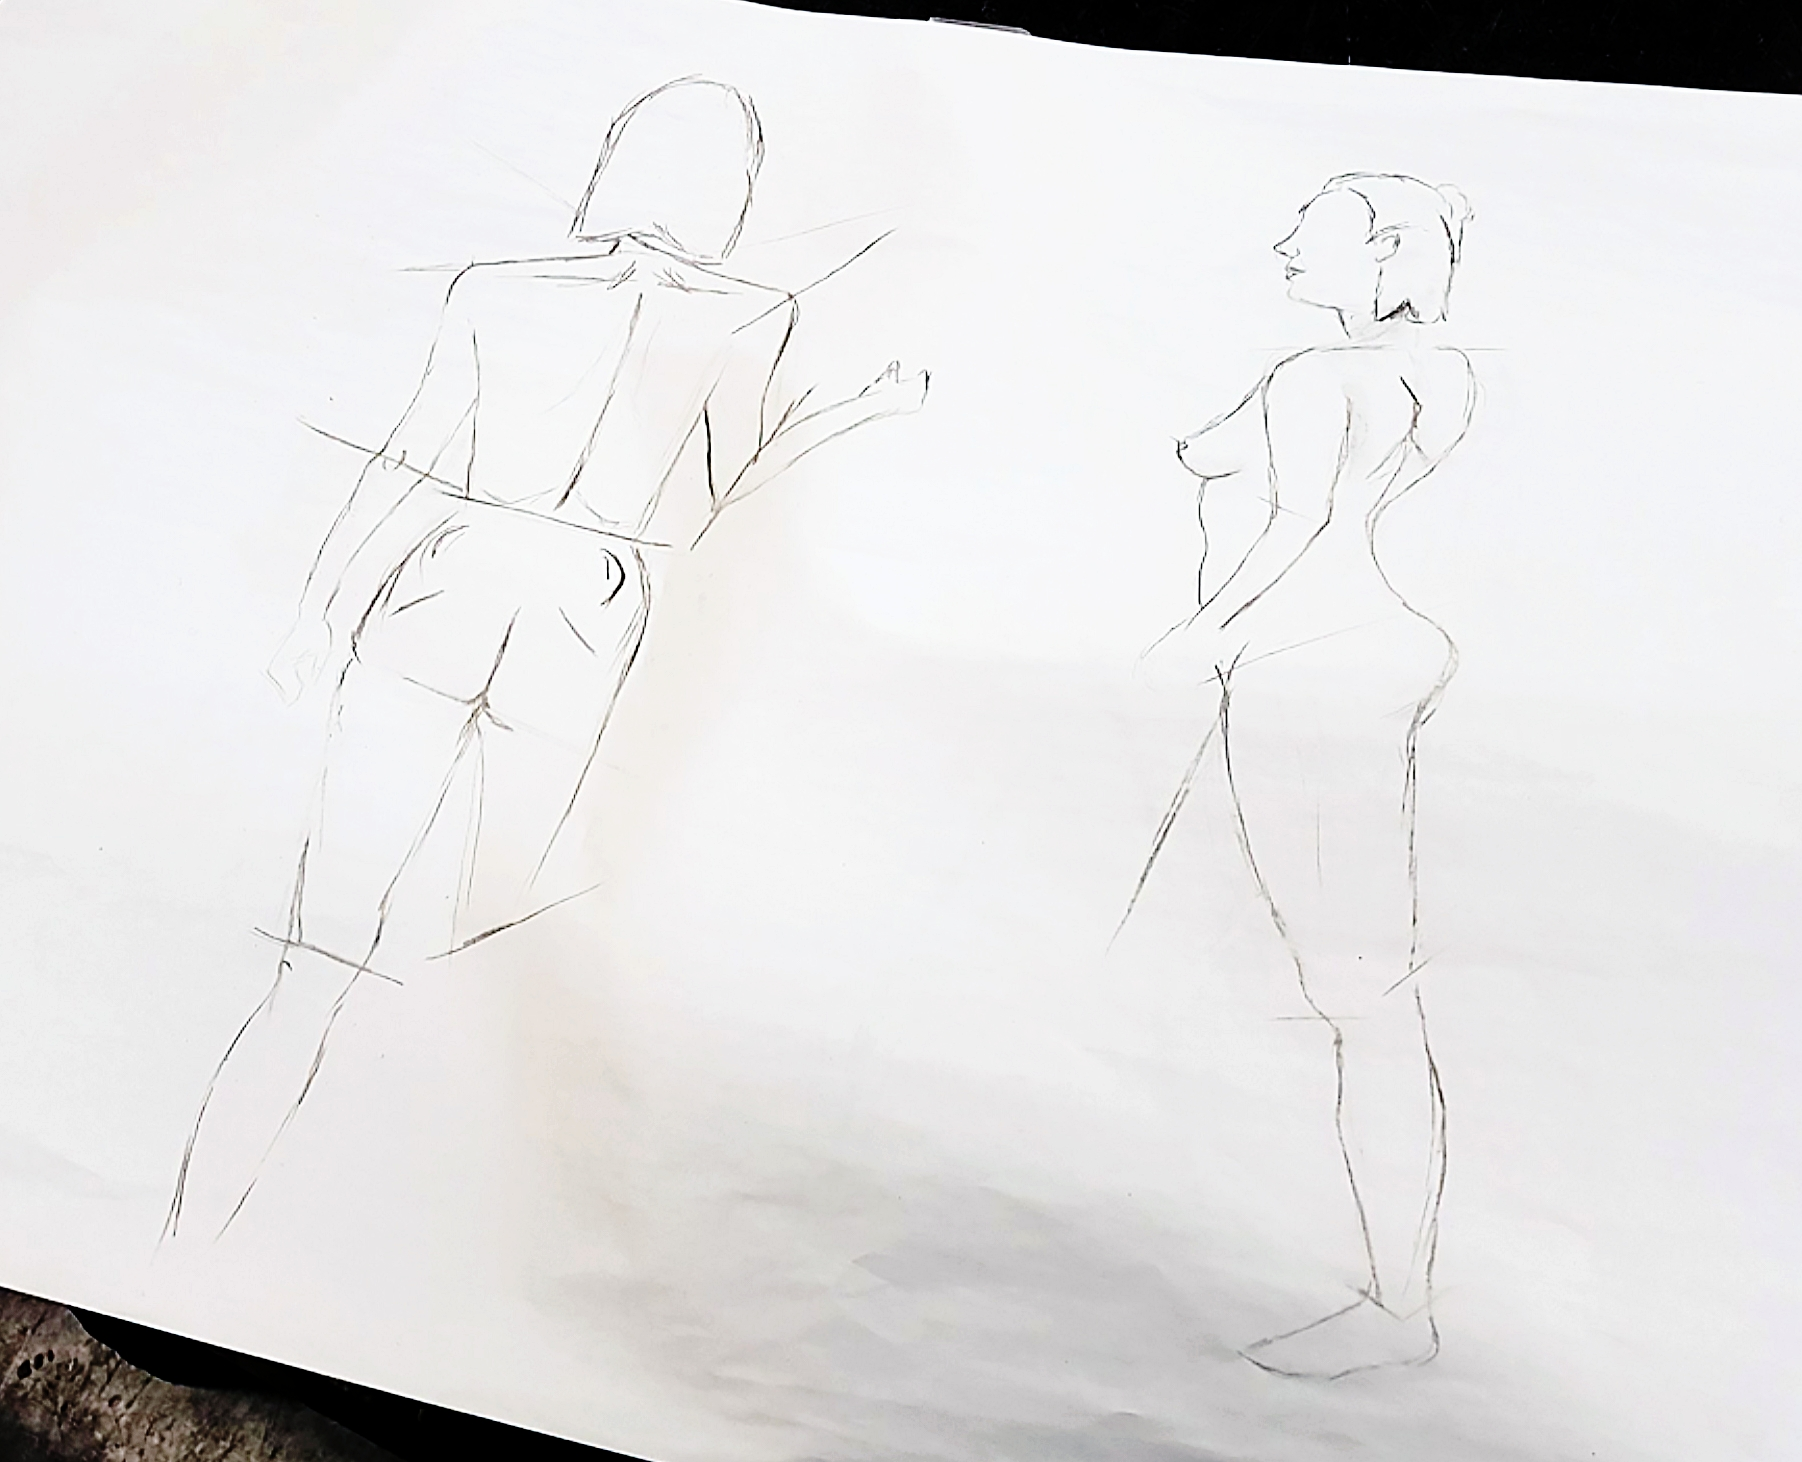 wax sketch 7.jpg